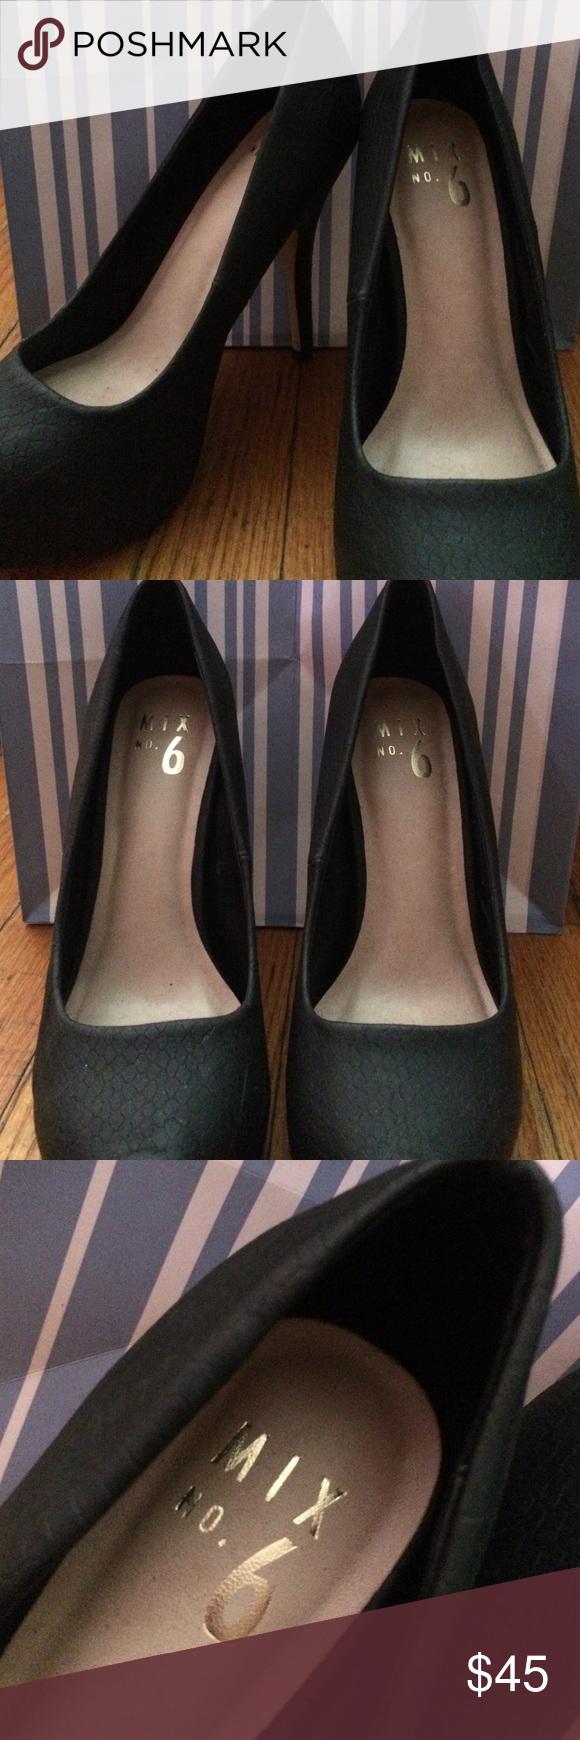 Selling this Mix No. 6 Black Heels in my Poshmark closet! My username is: richellerey. #shopmycloset #poshmark #fashion #shopping #style #forsale #Mix no.6 #Shoes